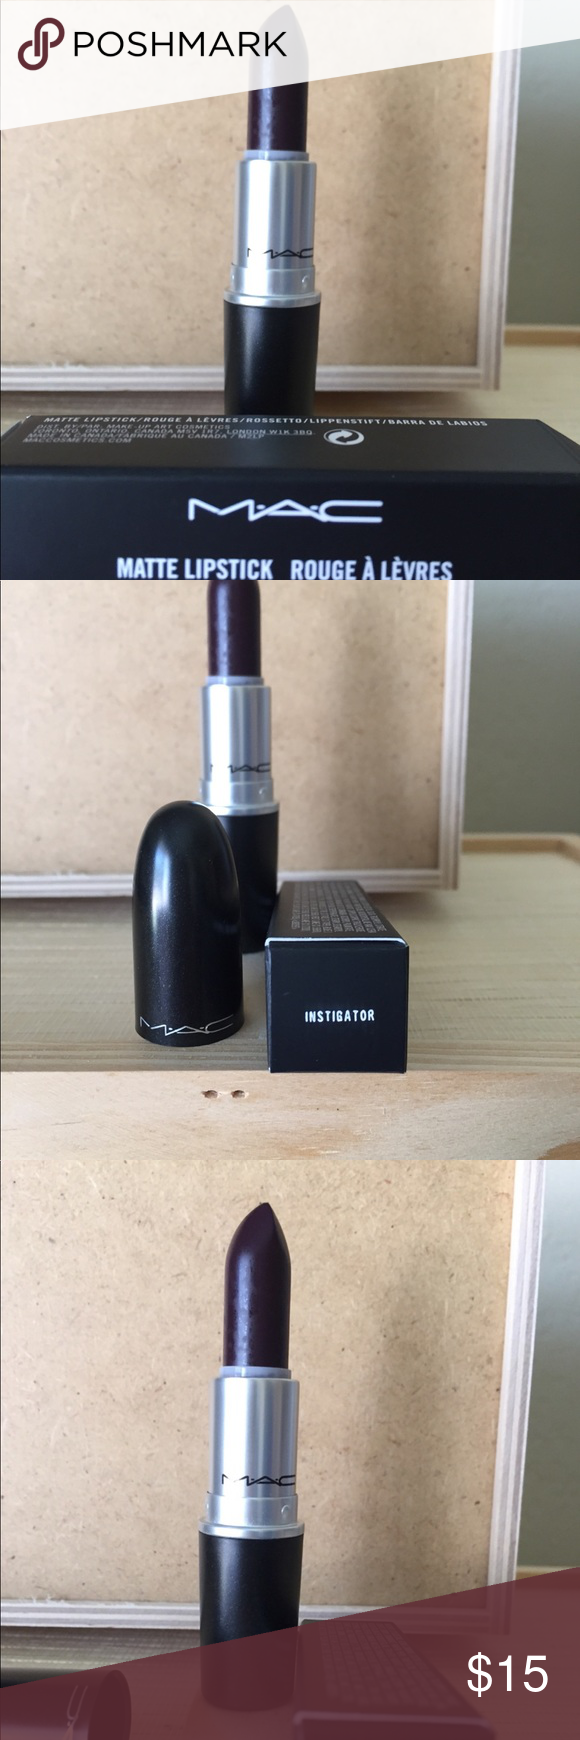 NEW MAC Matte Lipstick in Instigator New & 100 Authentic